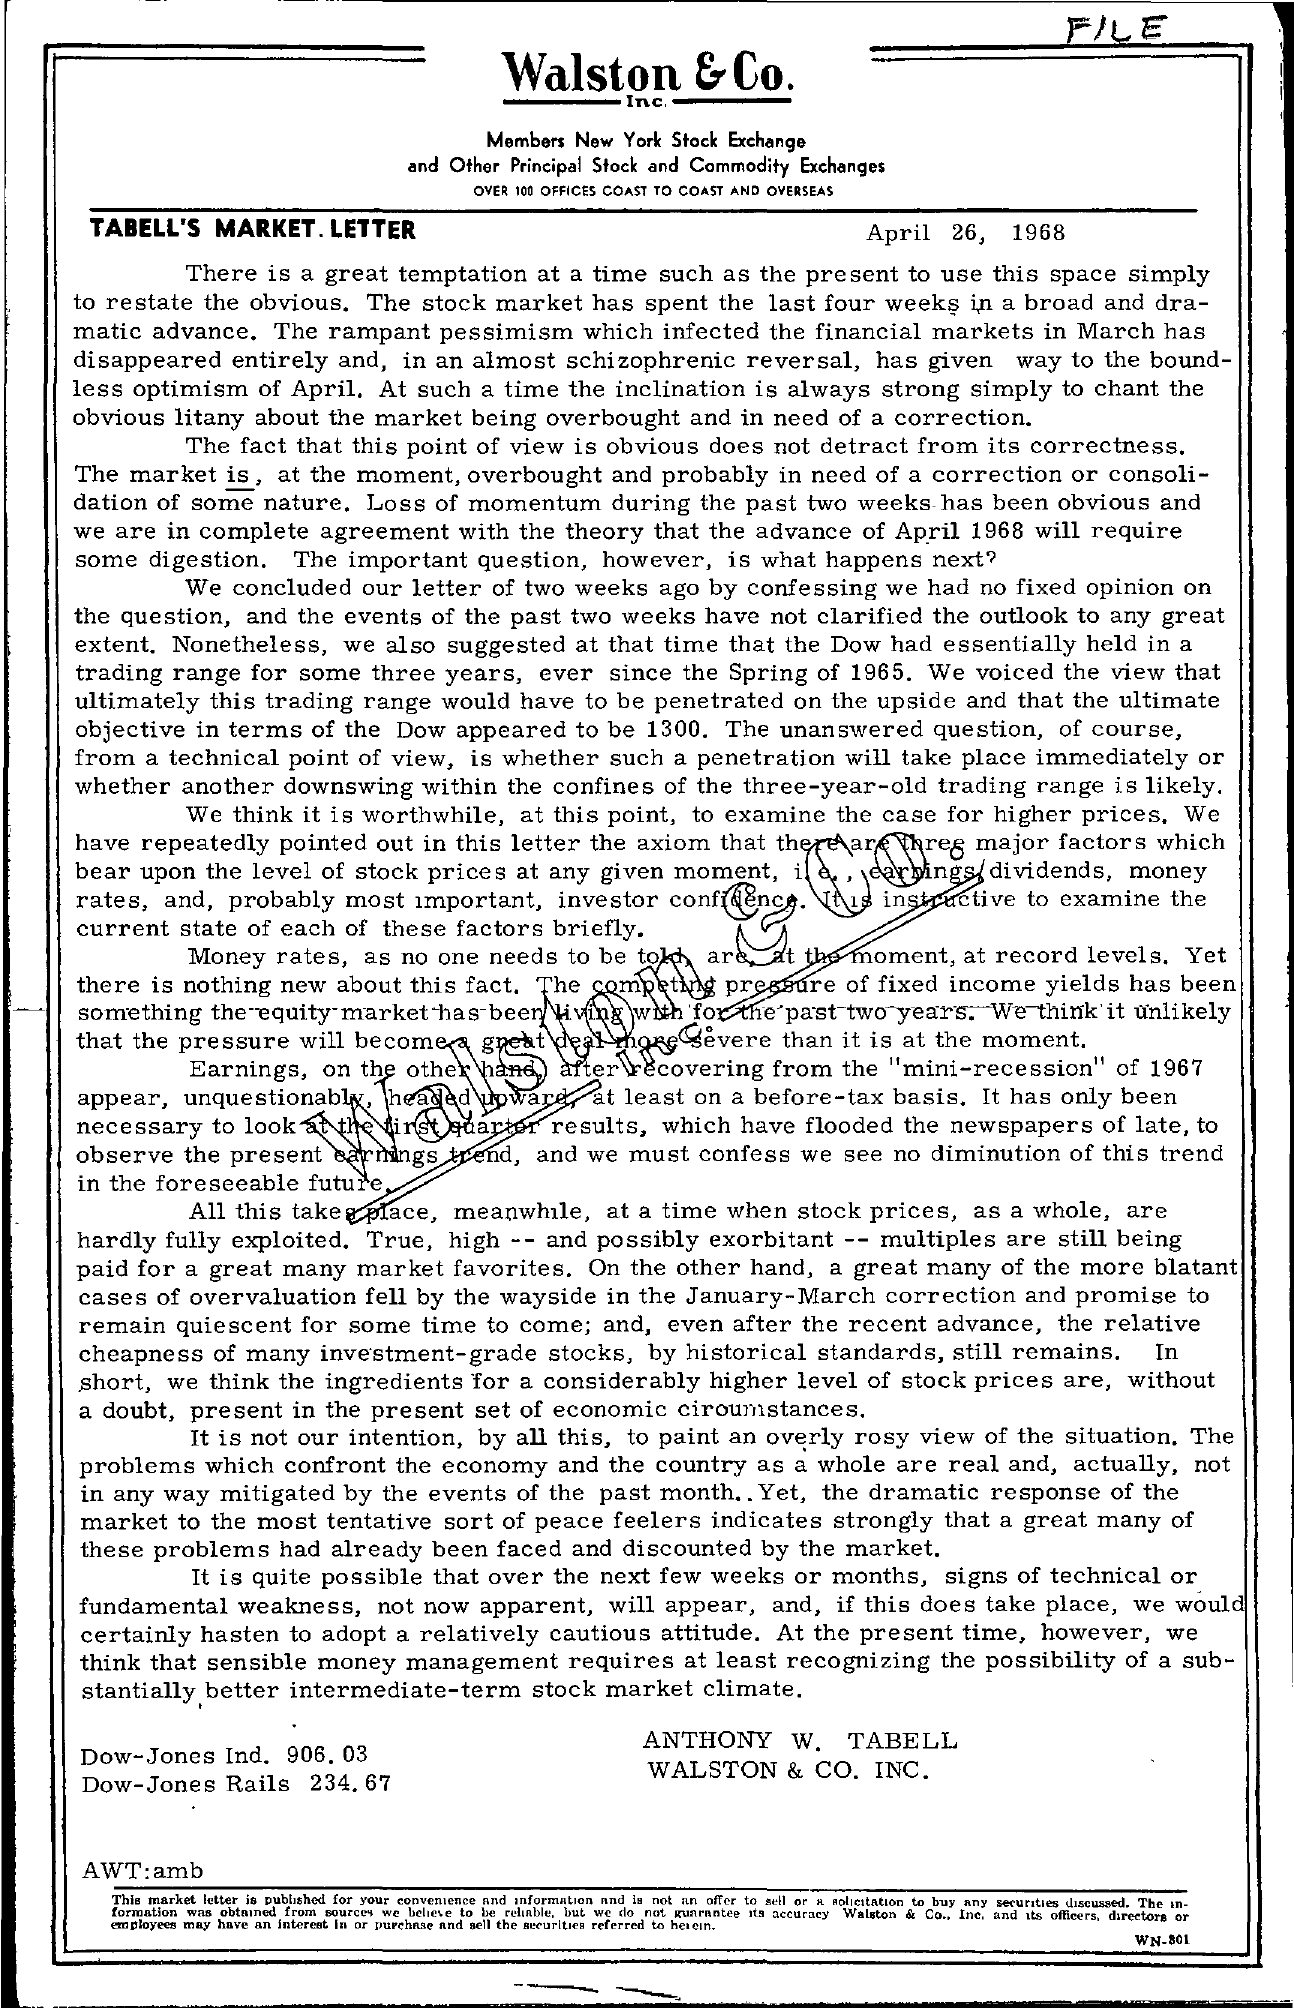 Tabell's Market Letter - April 26, 1968